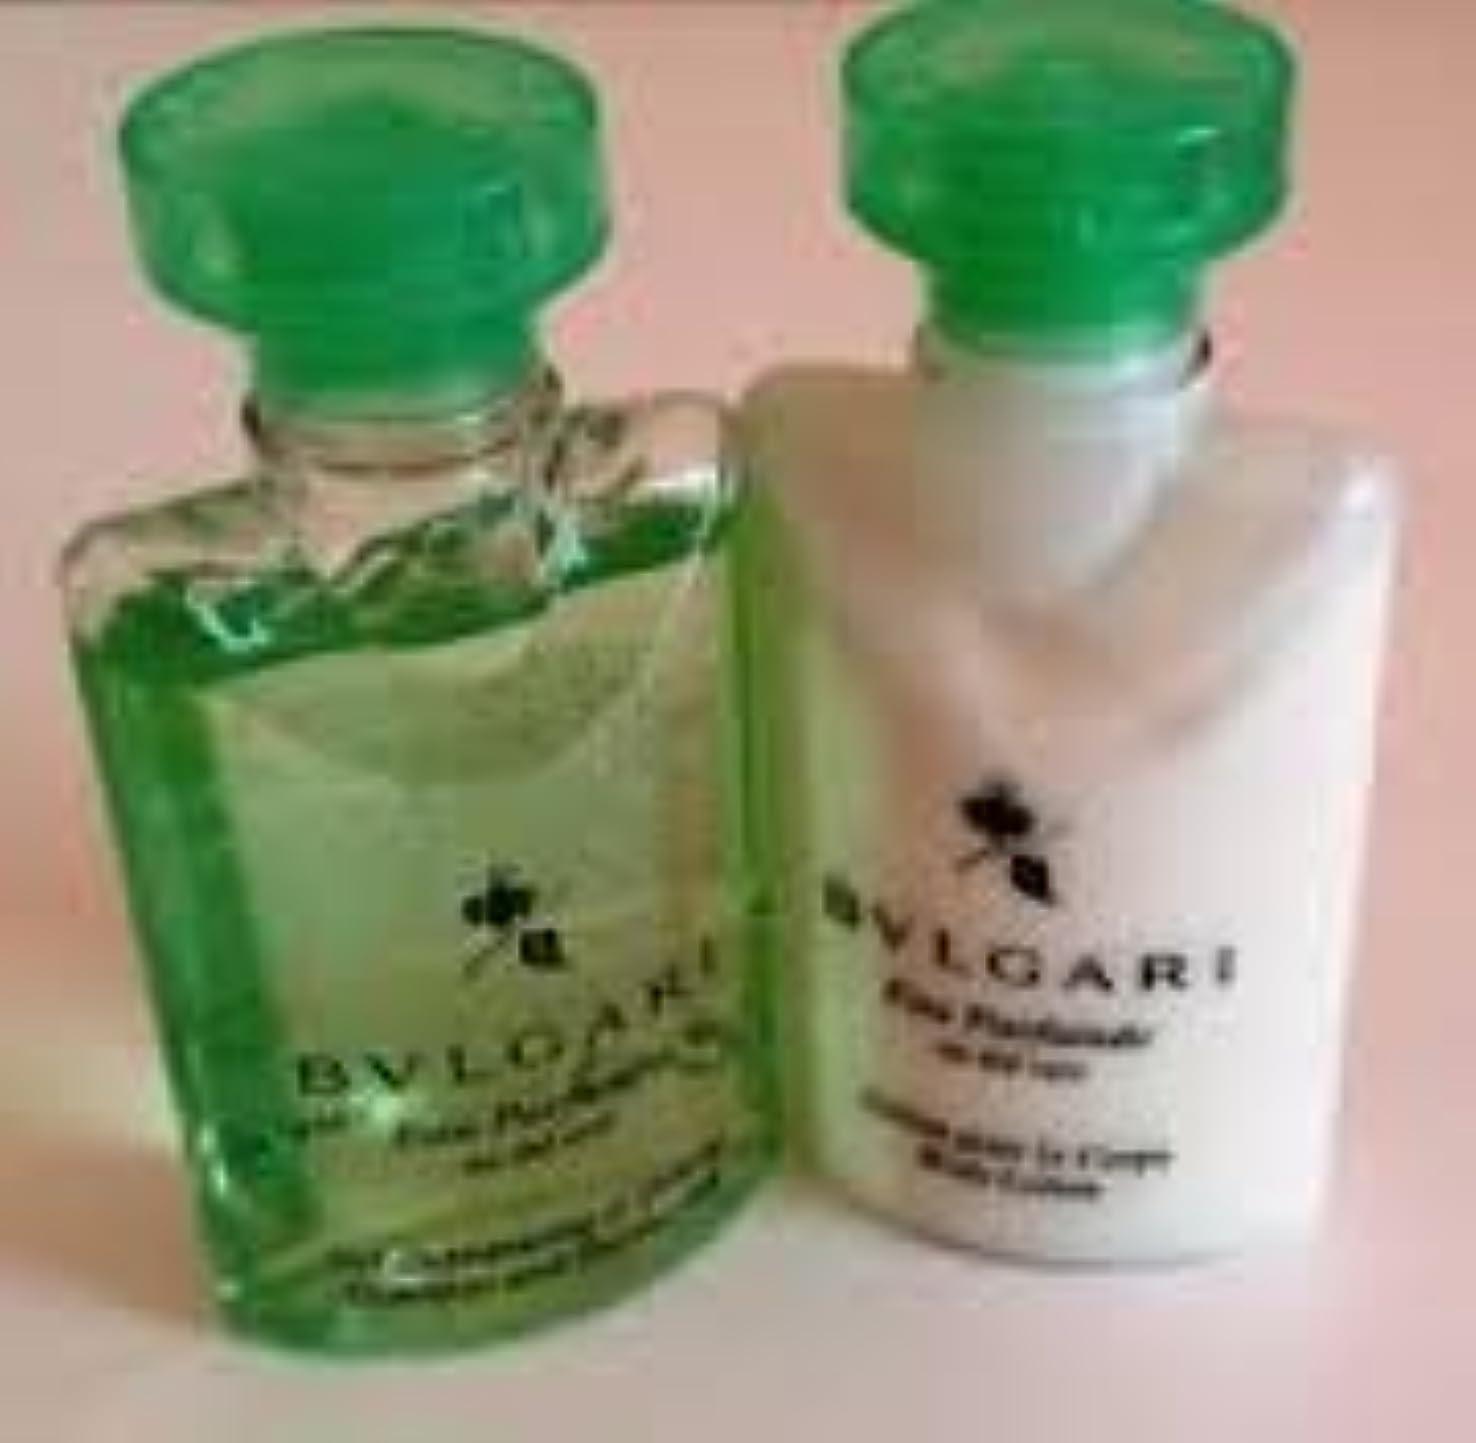 Bvlgari Eau Parfumee au the vert (ブルガリ オー パフュ-メ オウ ザ バート / グリーン ティー) 2.5 oz (75ml) シャンプー & ヘアーコンディショナー